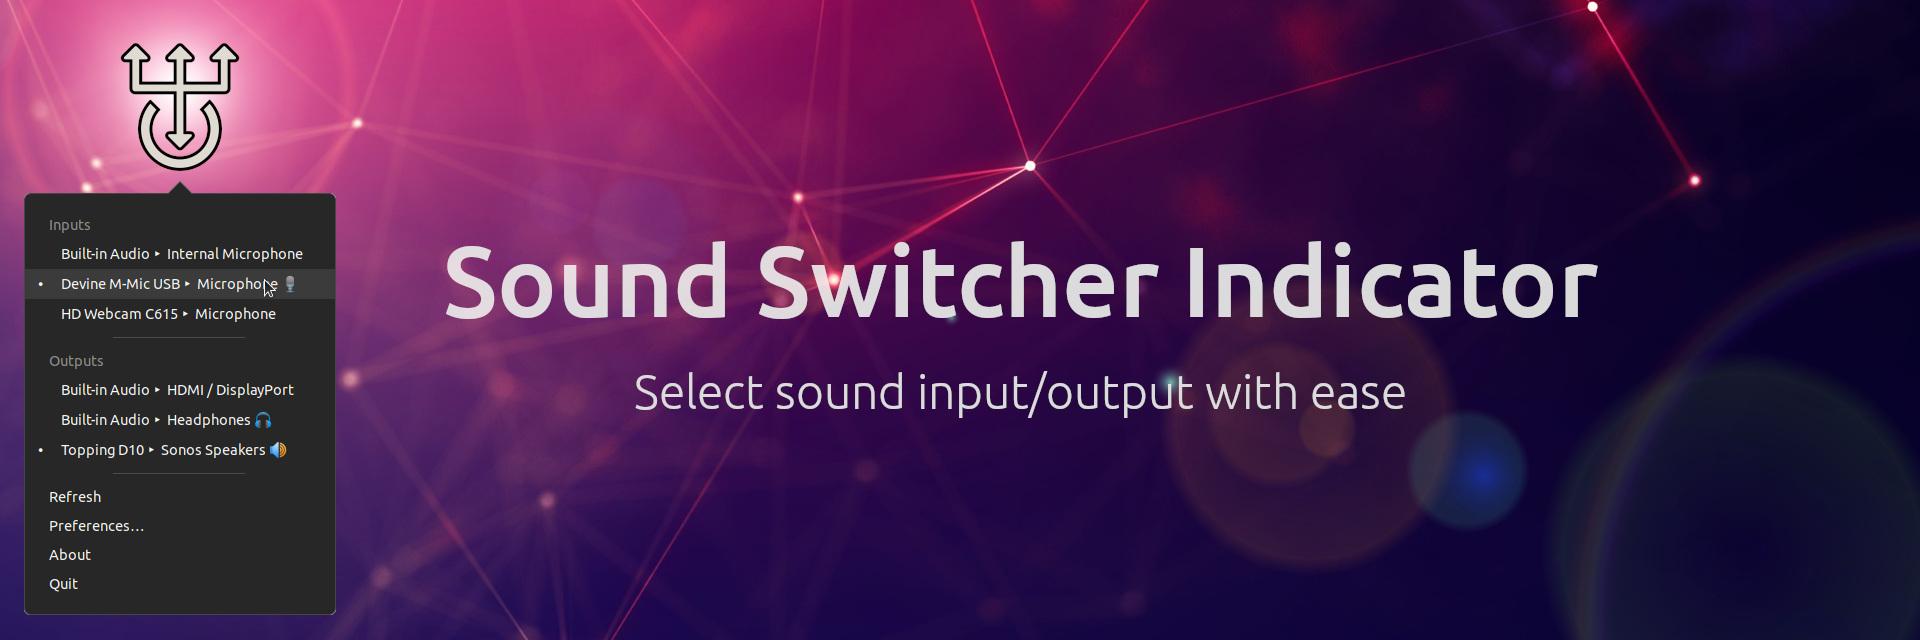 Sound Switcher Indicator banner